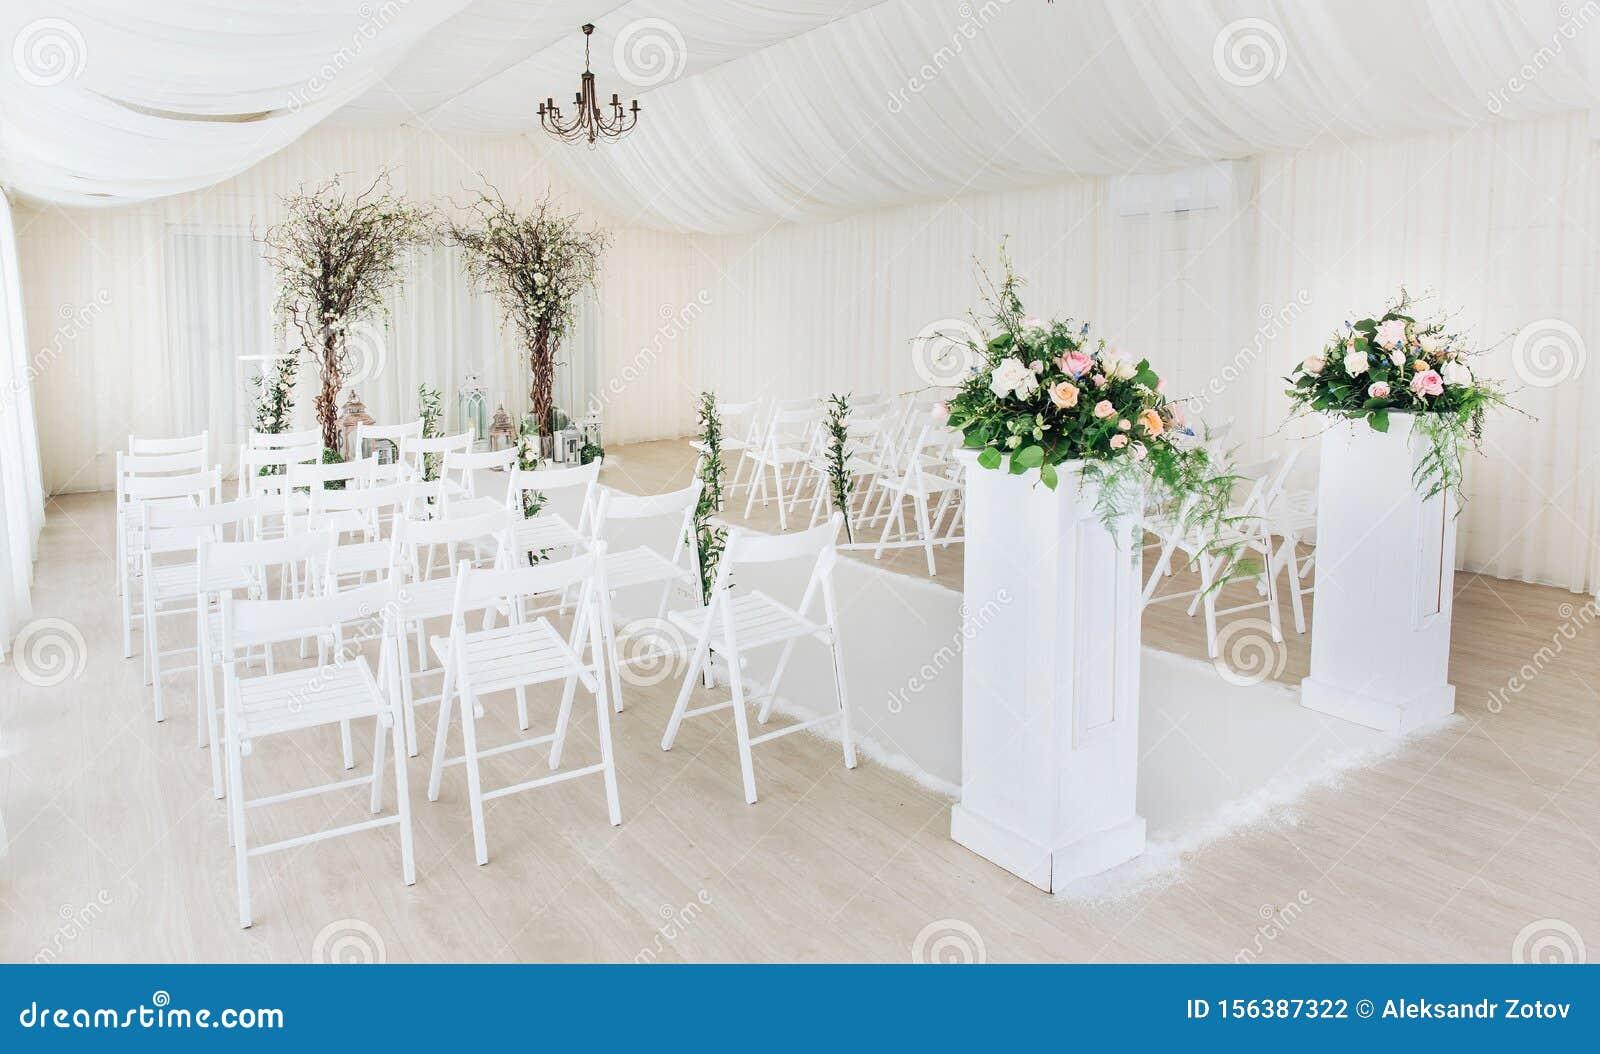 Open Air Wedding Ceremony Eucalyptus Wedding Royalty Free Stock